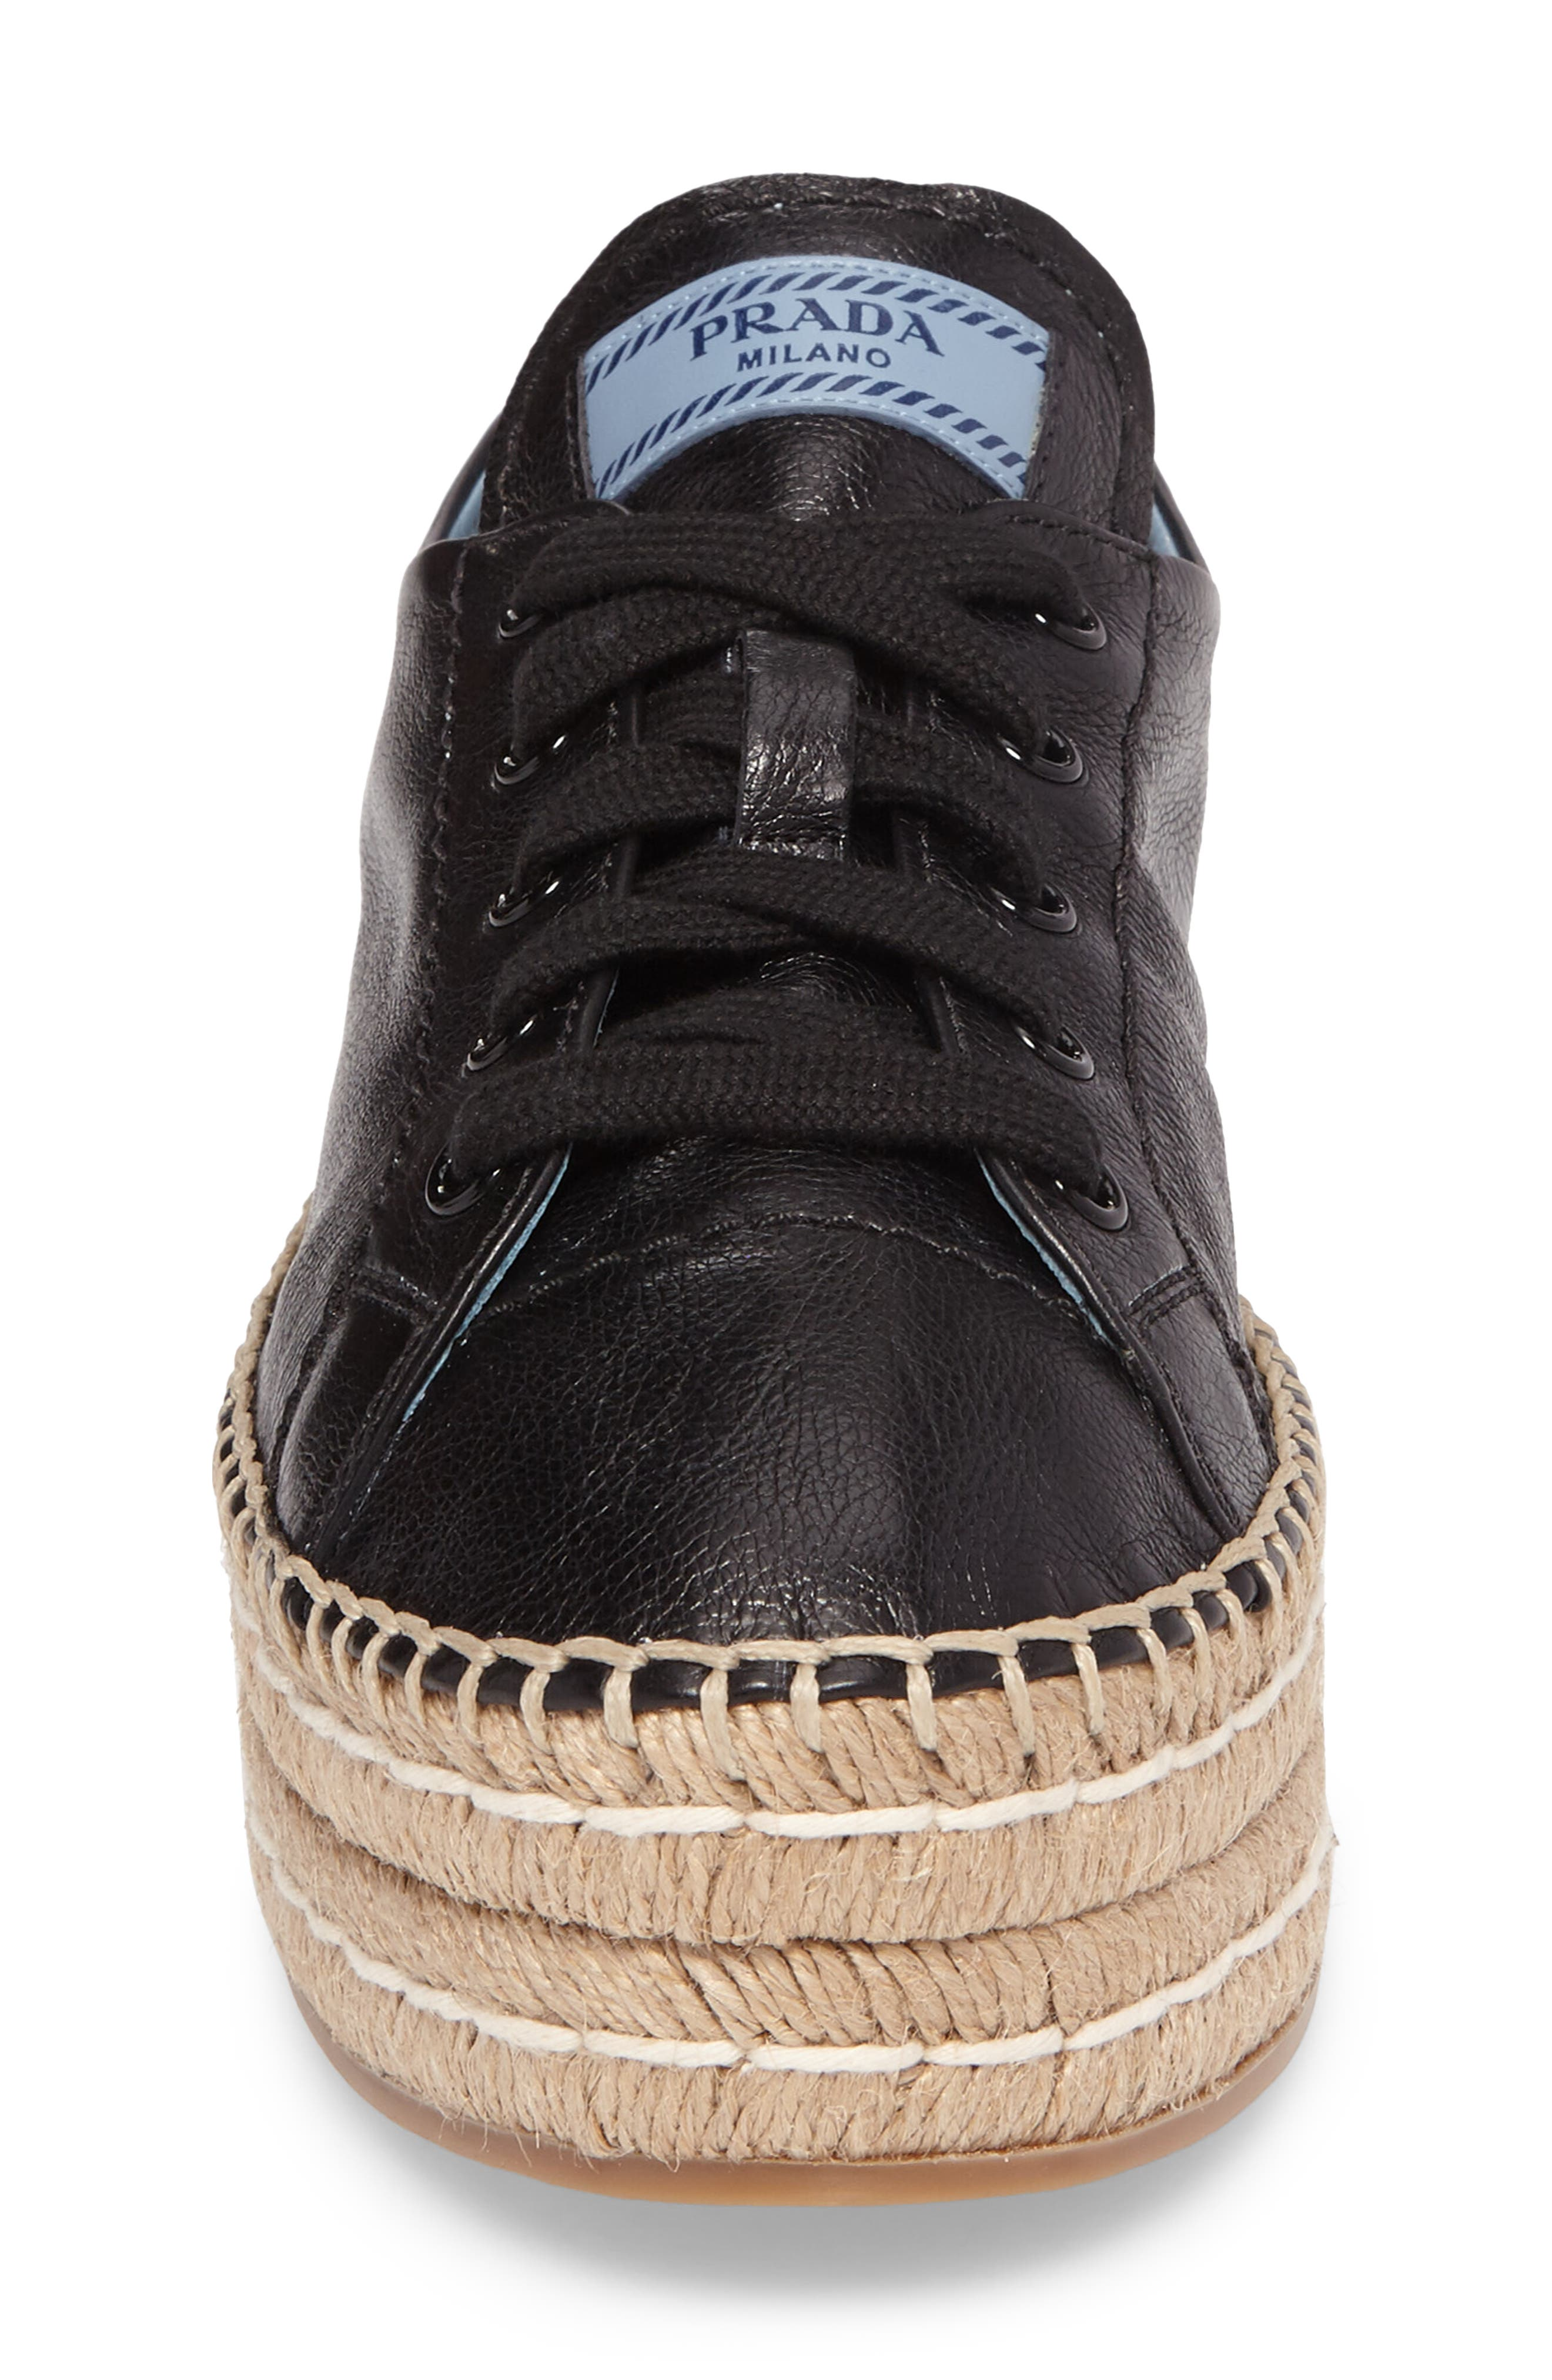 Flatform Espadrille Sneaker,                             Alternate thumbnail 4, color,                             Black